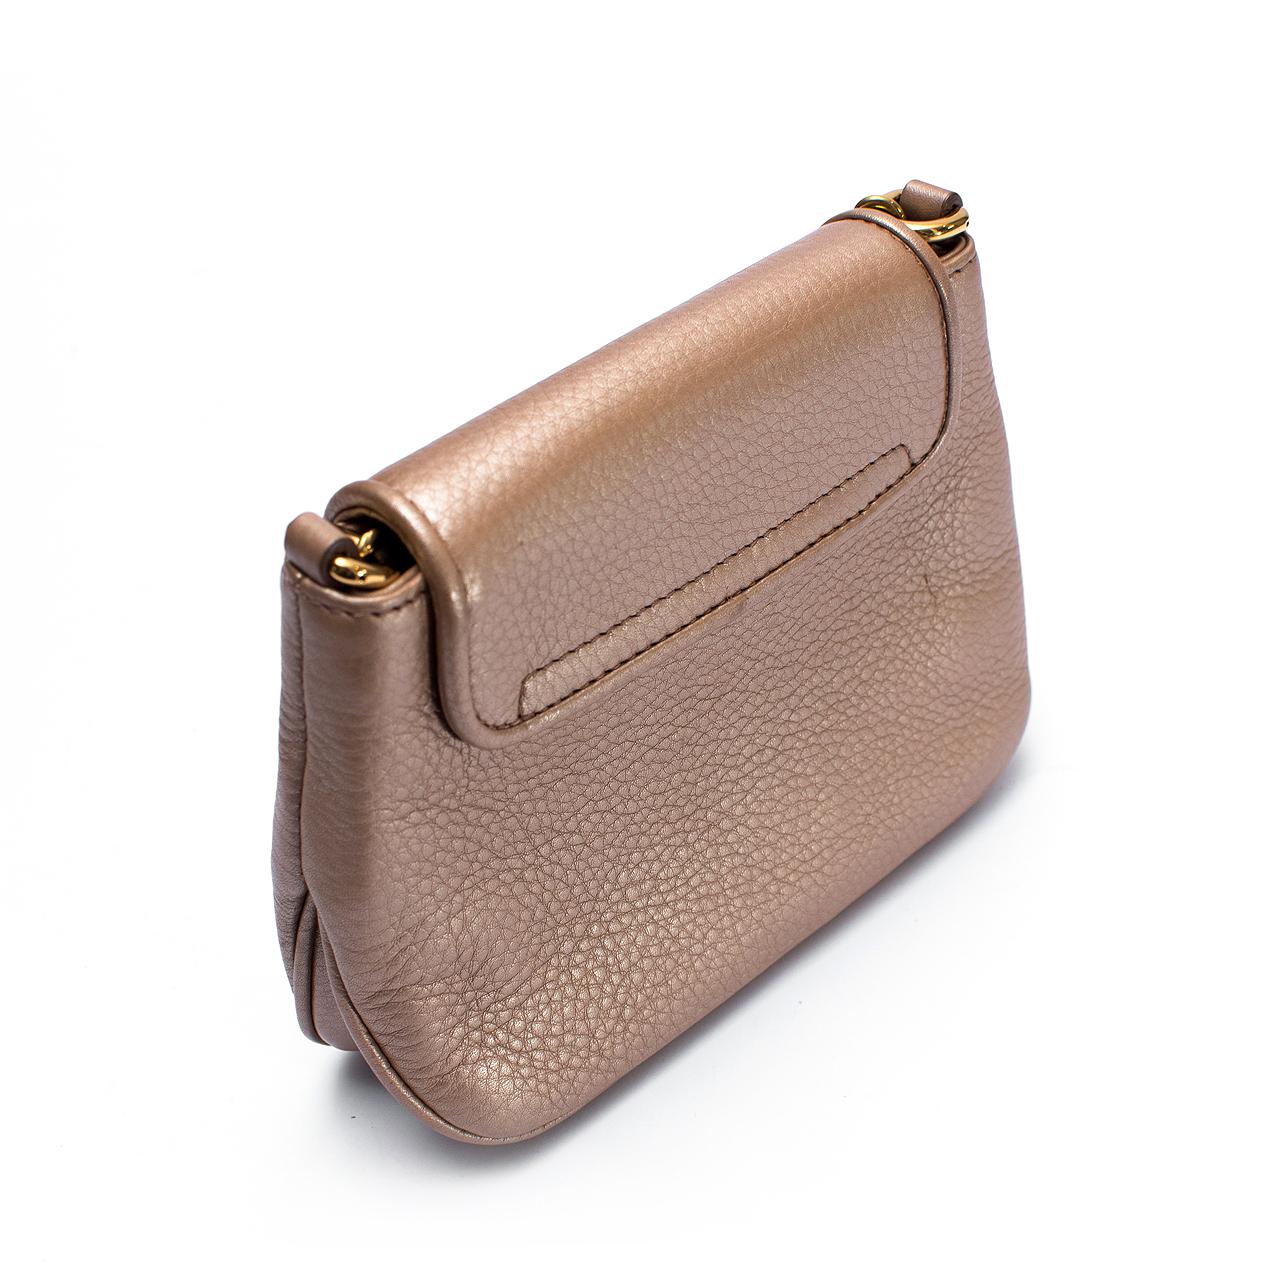 Bolsa Gucci Pequena Inspired : Bolsa gucci box de grife